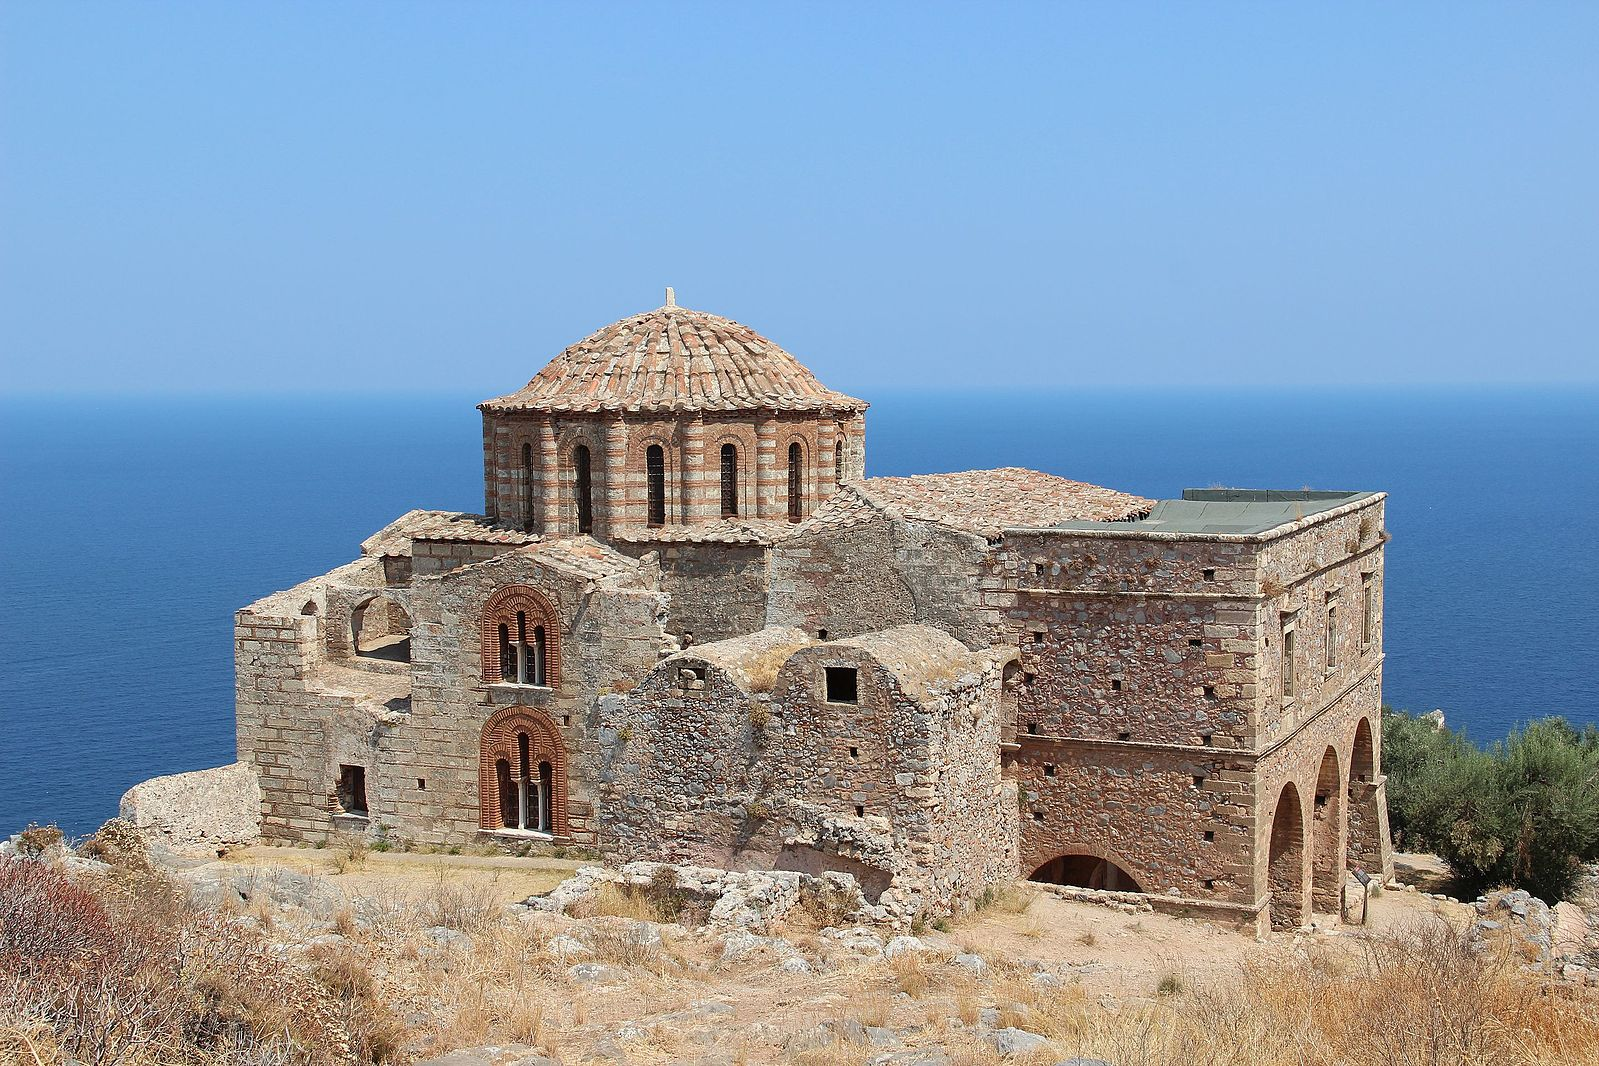 Monemvasia, Greece - Greek Peloponnese round tour in 15 days. Visit all main attraction of Peloponnese peninsula and see castles, ancient places, beaches. This is Peloponnese where located Sparta, Corinth, Mycenae, Epidaurus, Monemvasia.